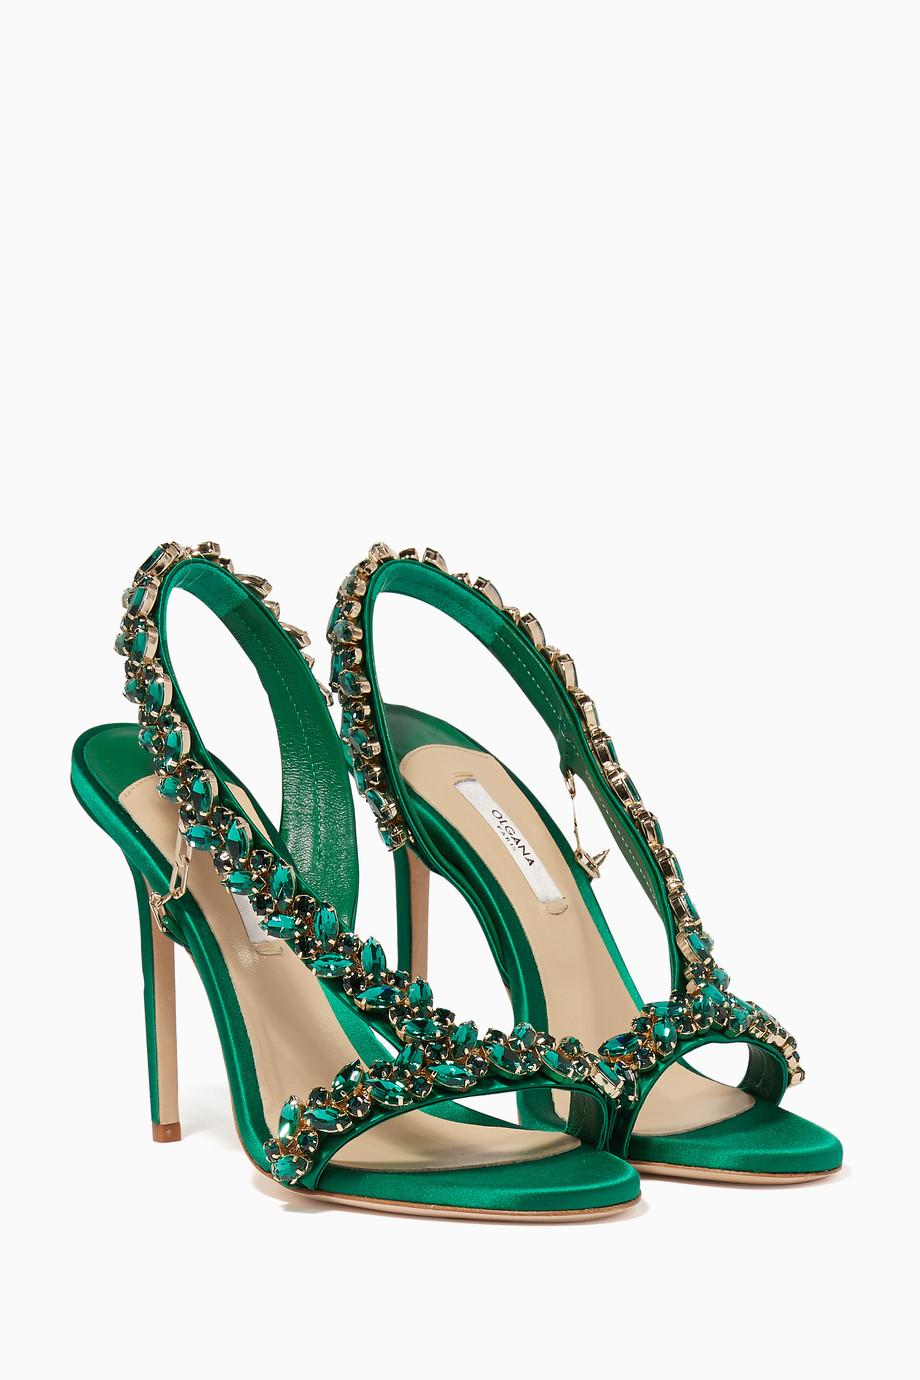 fb33f163694989 Shop Olgana Green Green Amazon Swarovski Embellished Sandals for ...